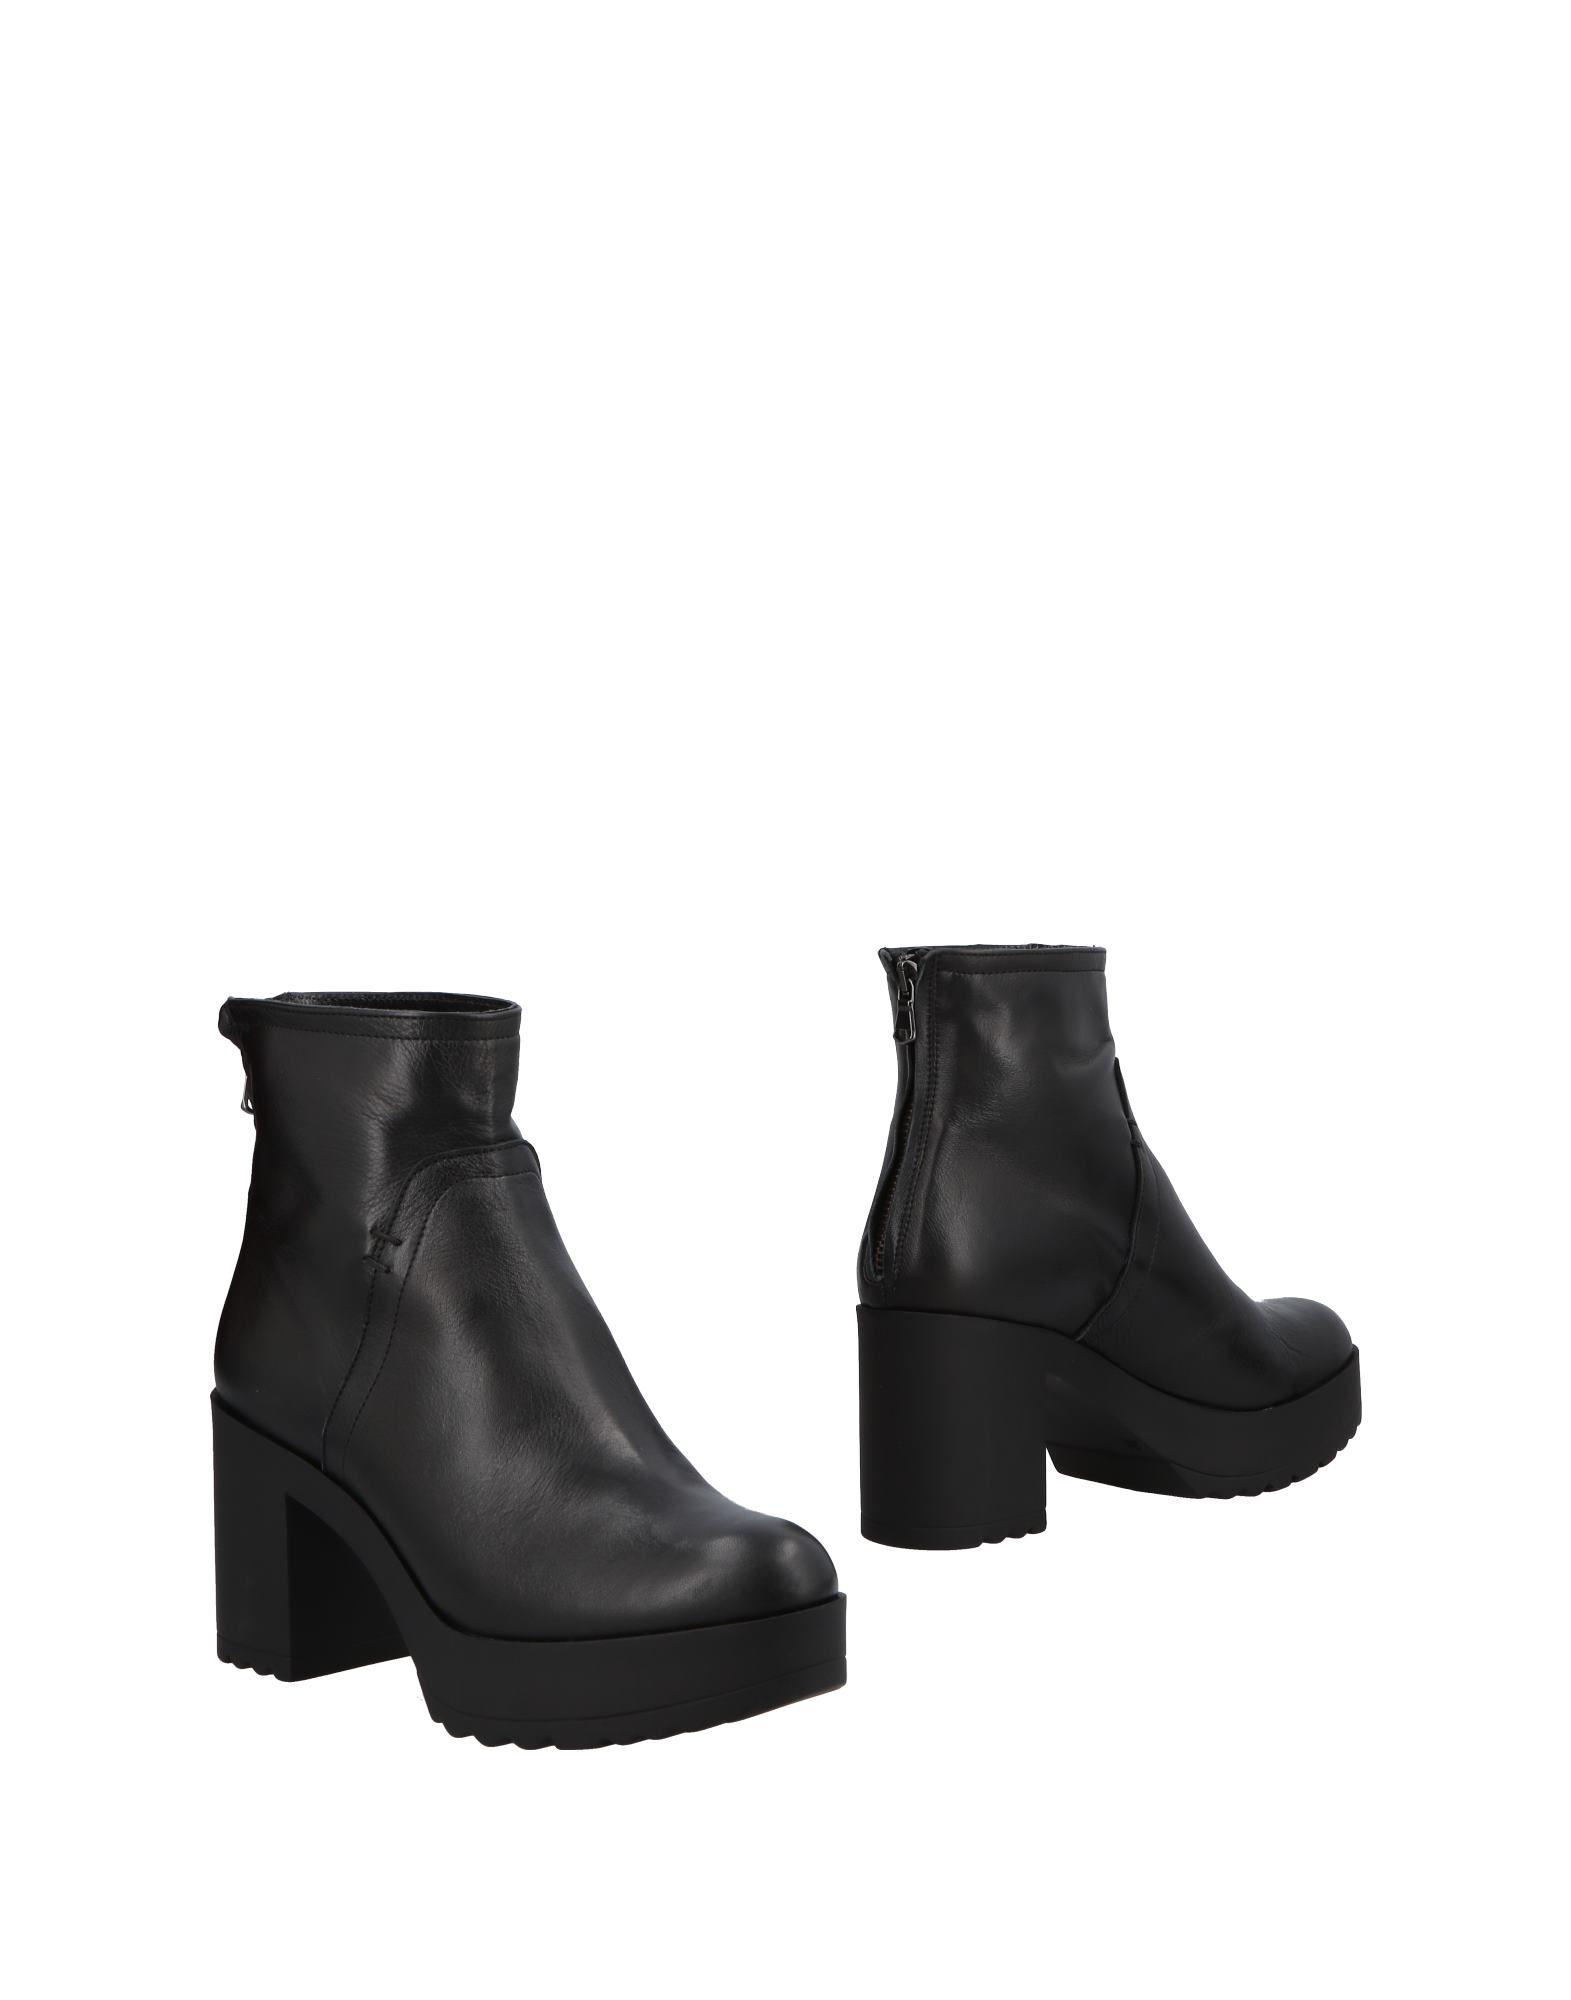 Gut um Gatièr billige Schuhe zu tragenPhil Gatièr um By Repo Stiefelette Damen  11480055RL 80c7fc